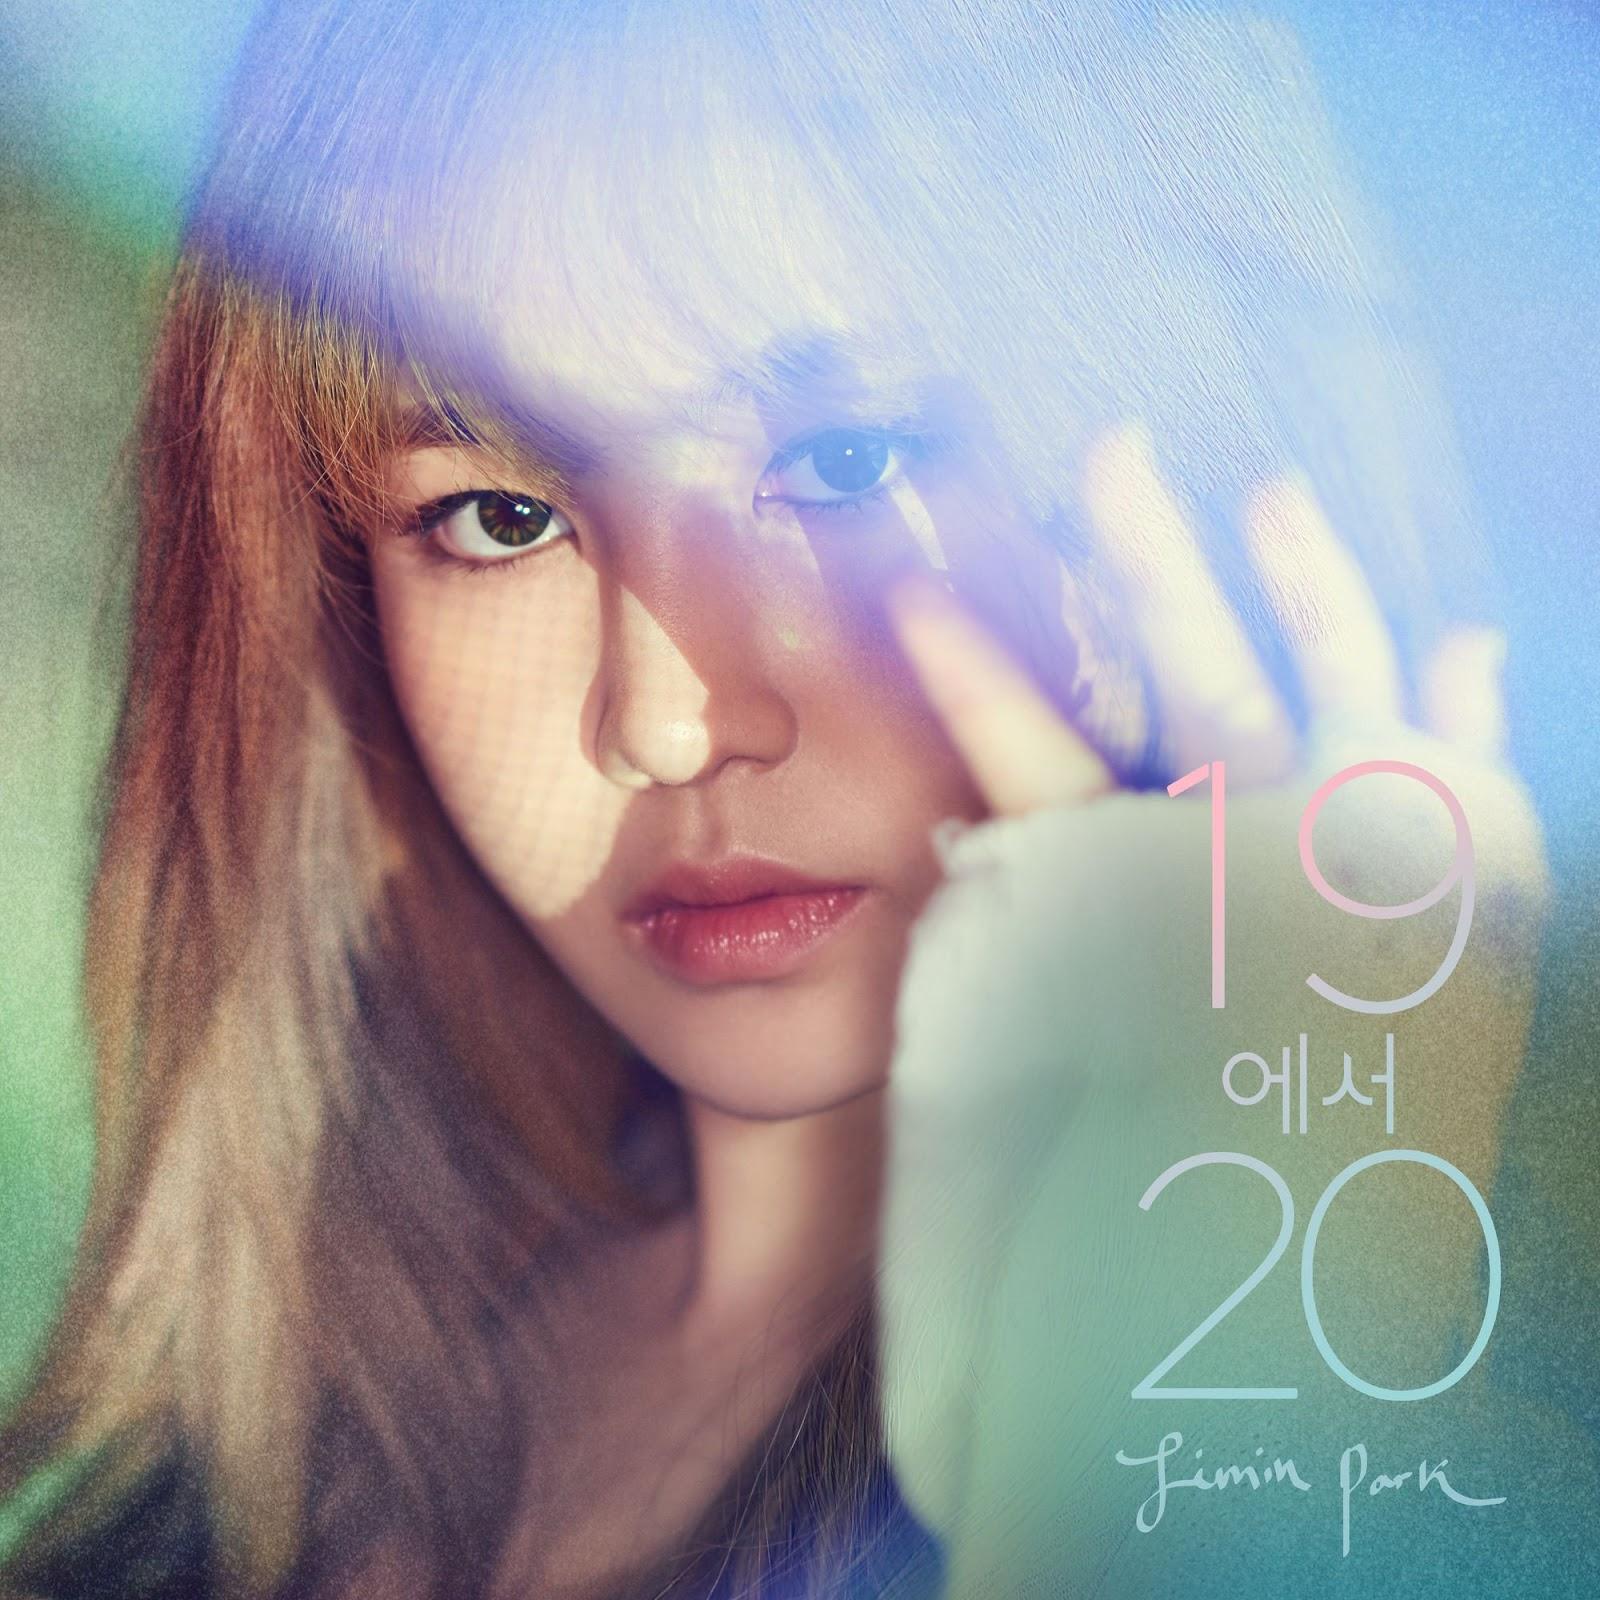 Kpop Hotness: [DOWNLOAD] Jimin Park - 19 to 20